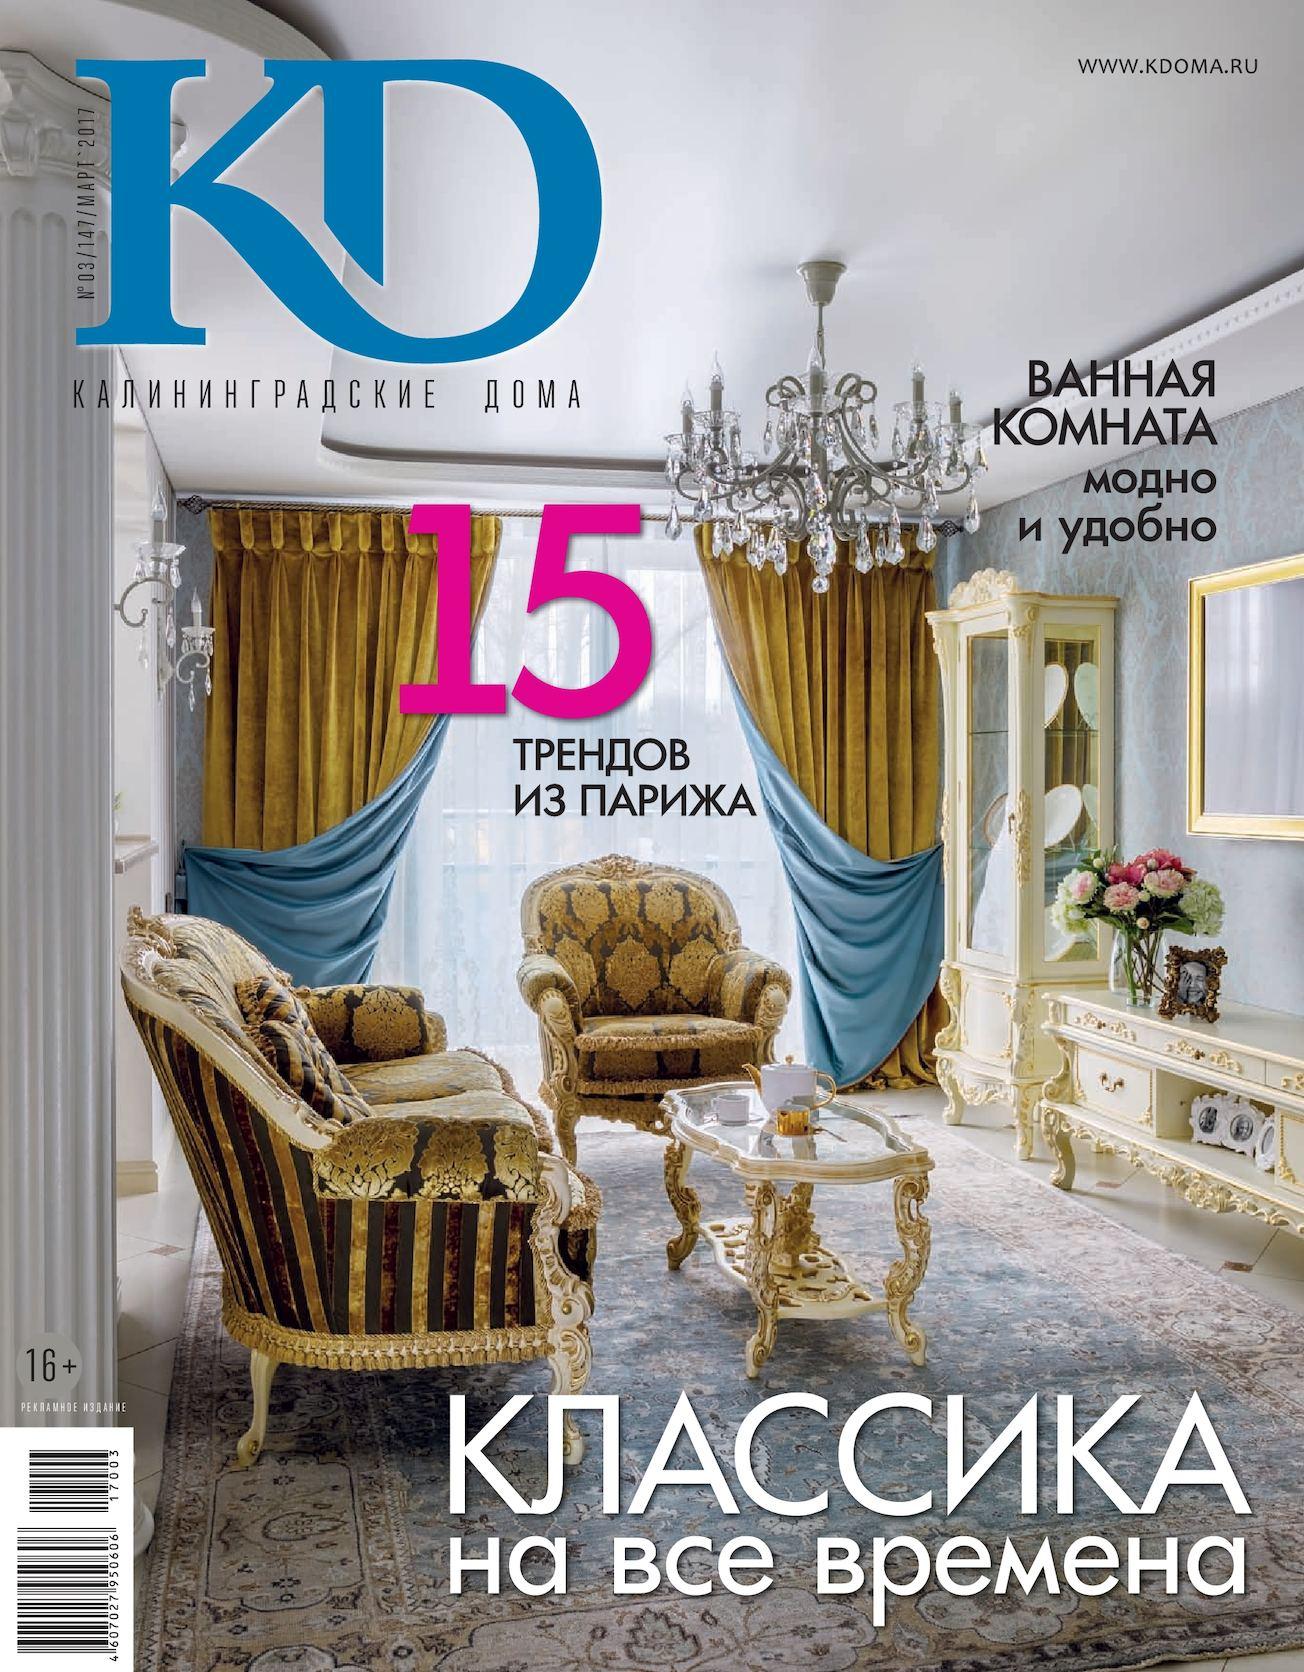 Калининградские дома №03 (147) март 2017